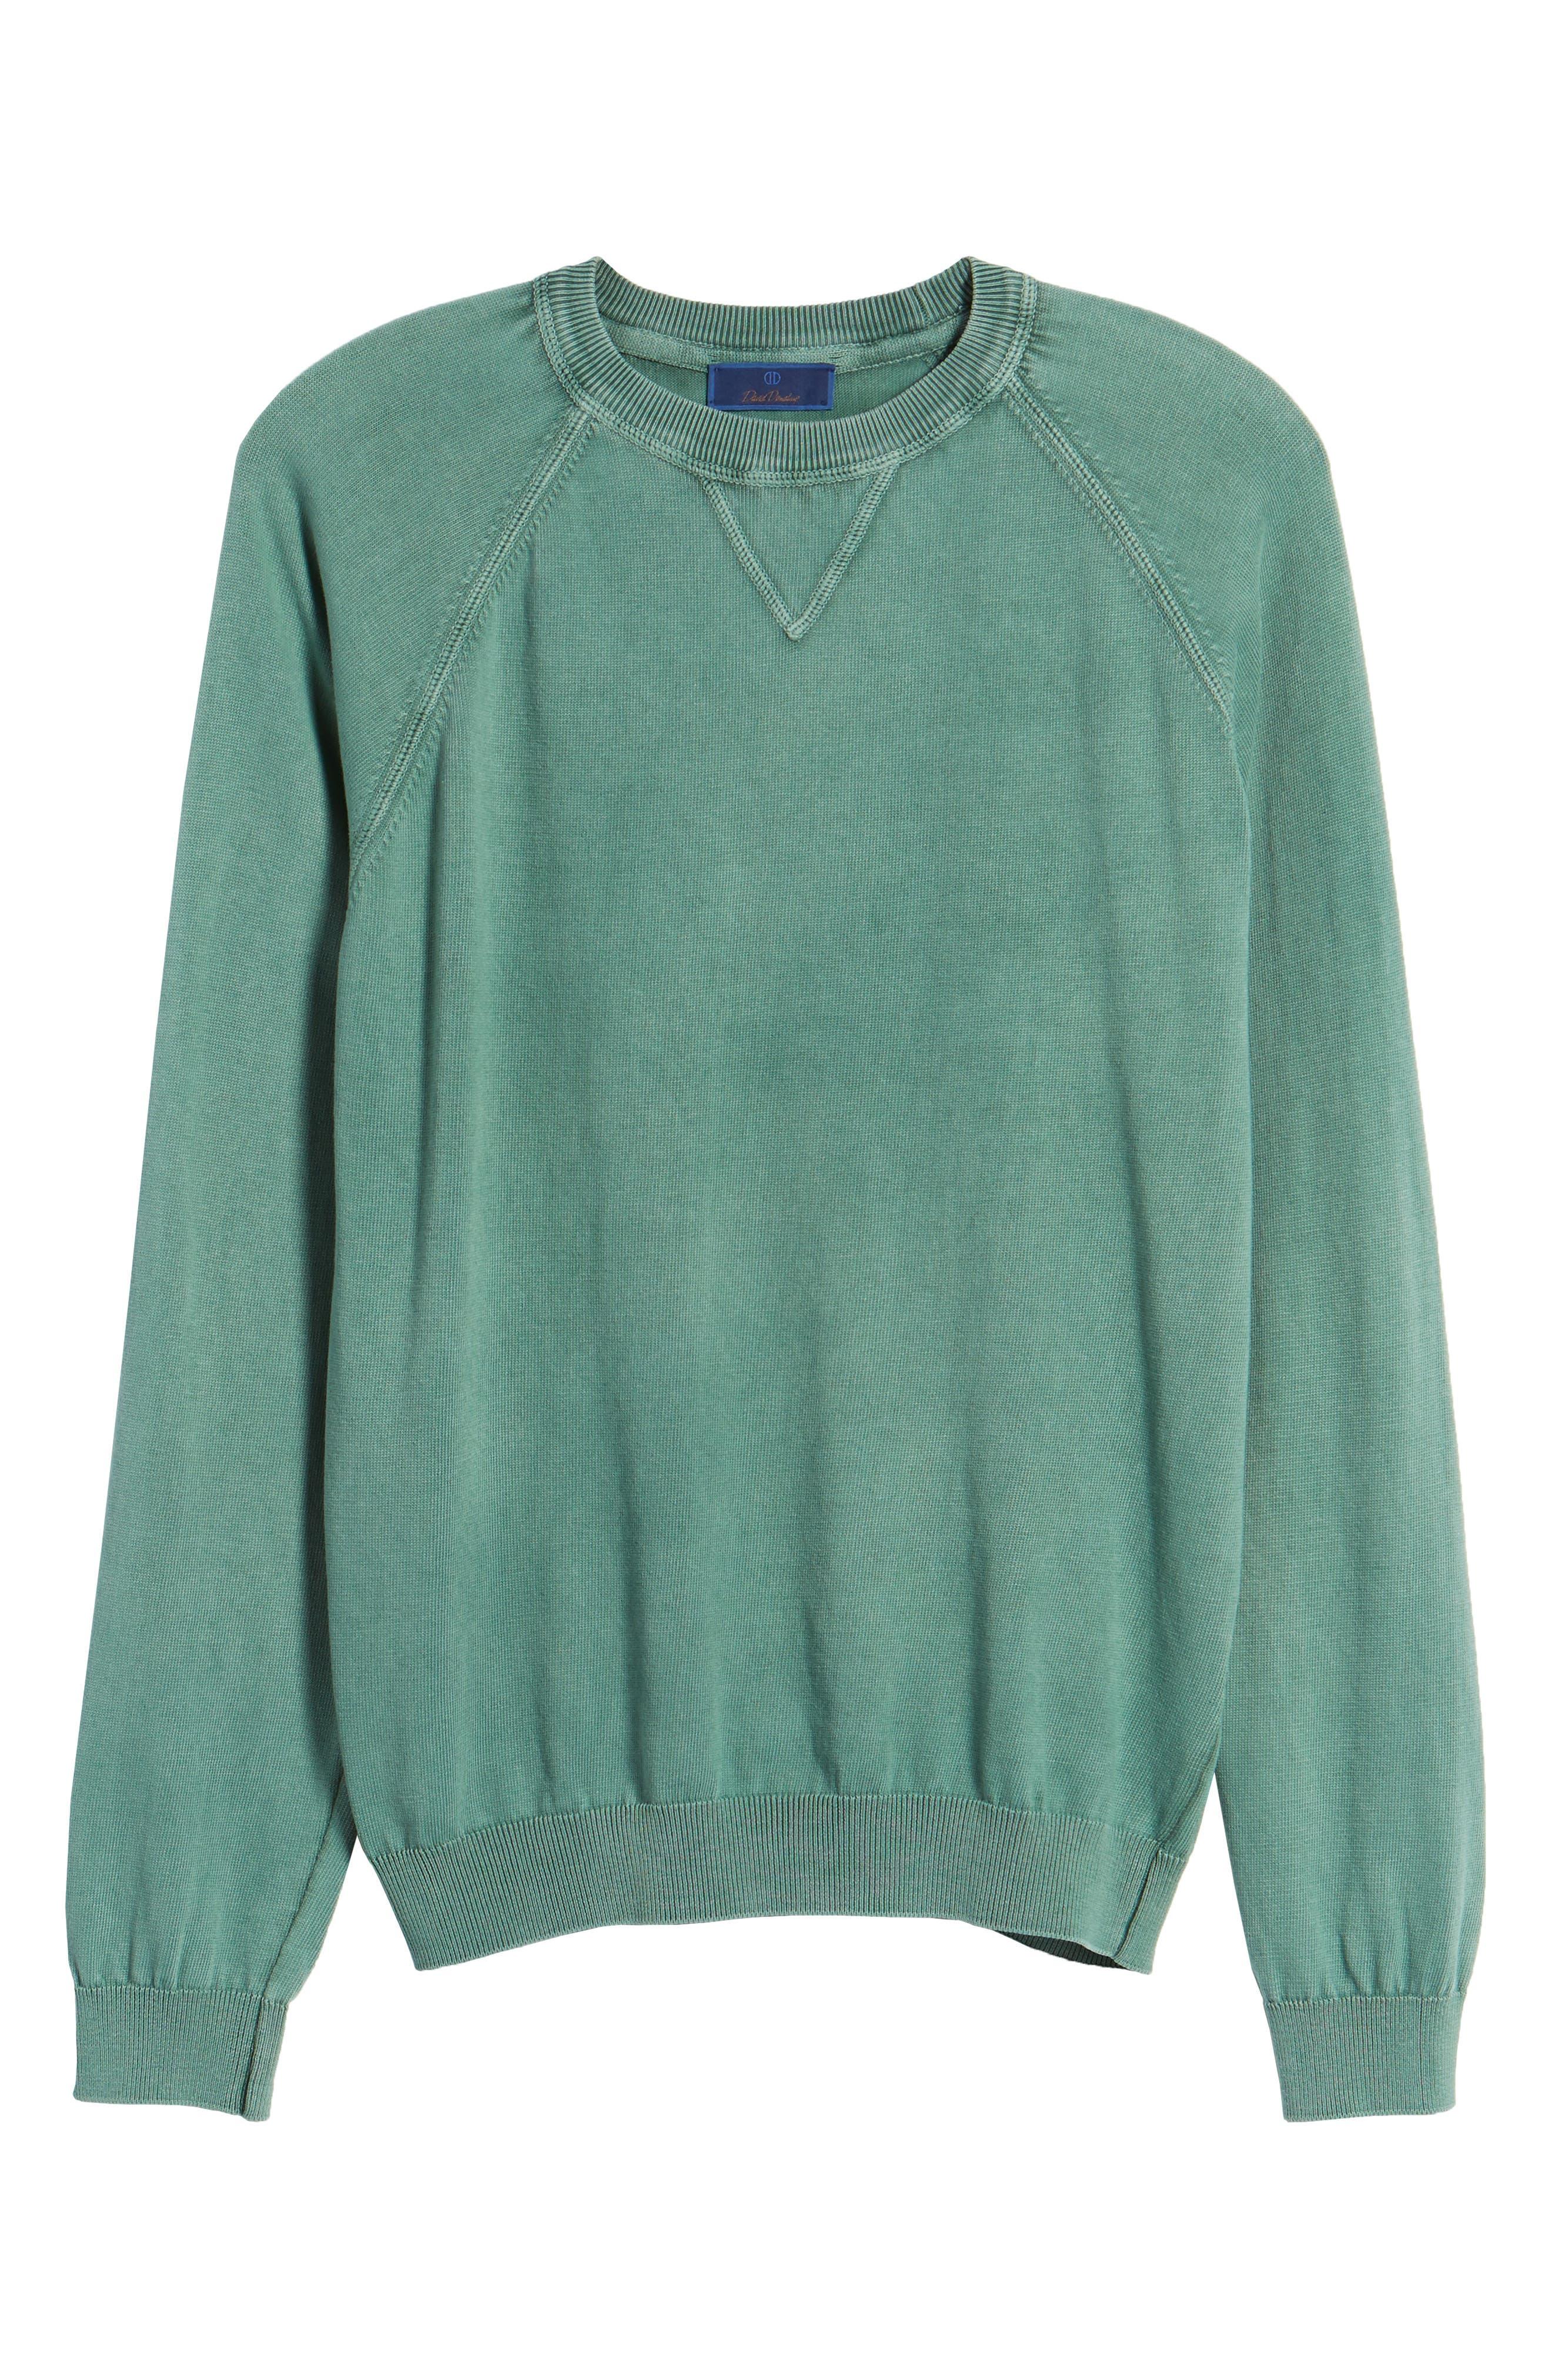 Stonewash Cotton Sweatshirt,                             Alternate thumbnail 6, color,                             333